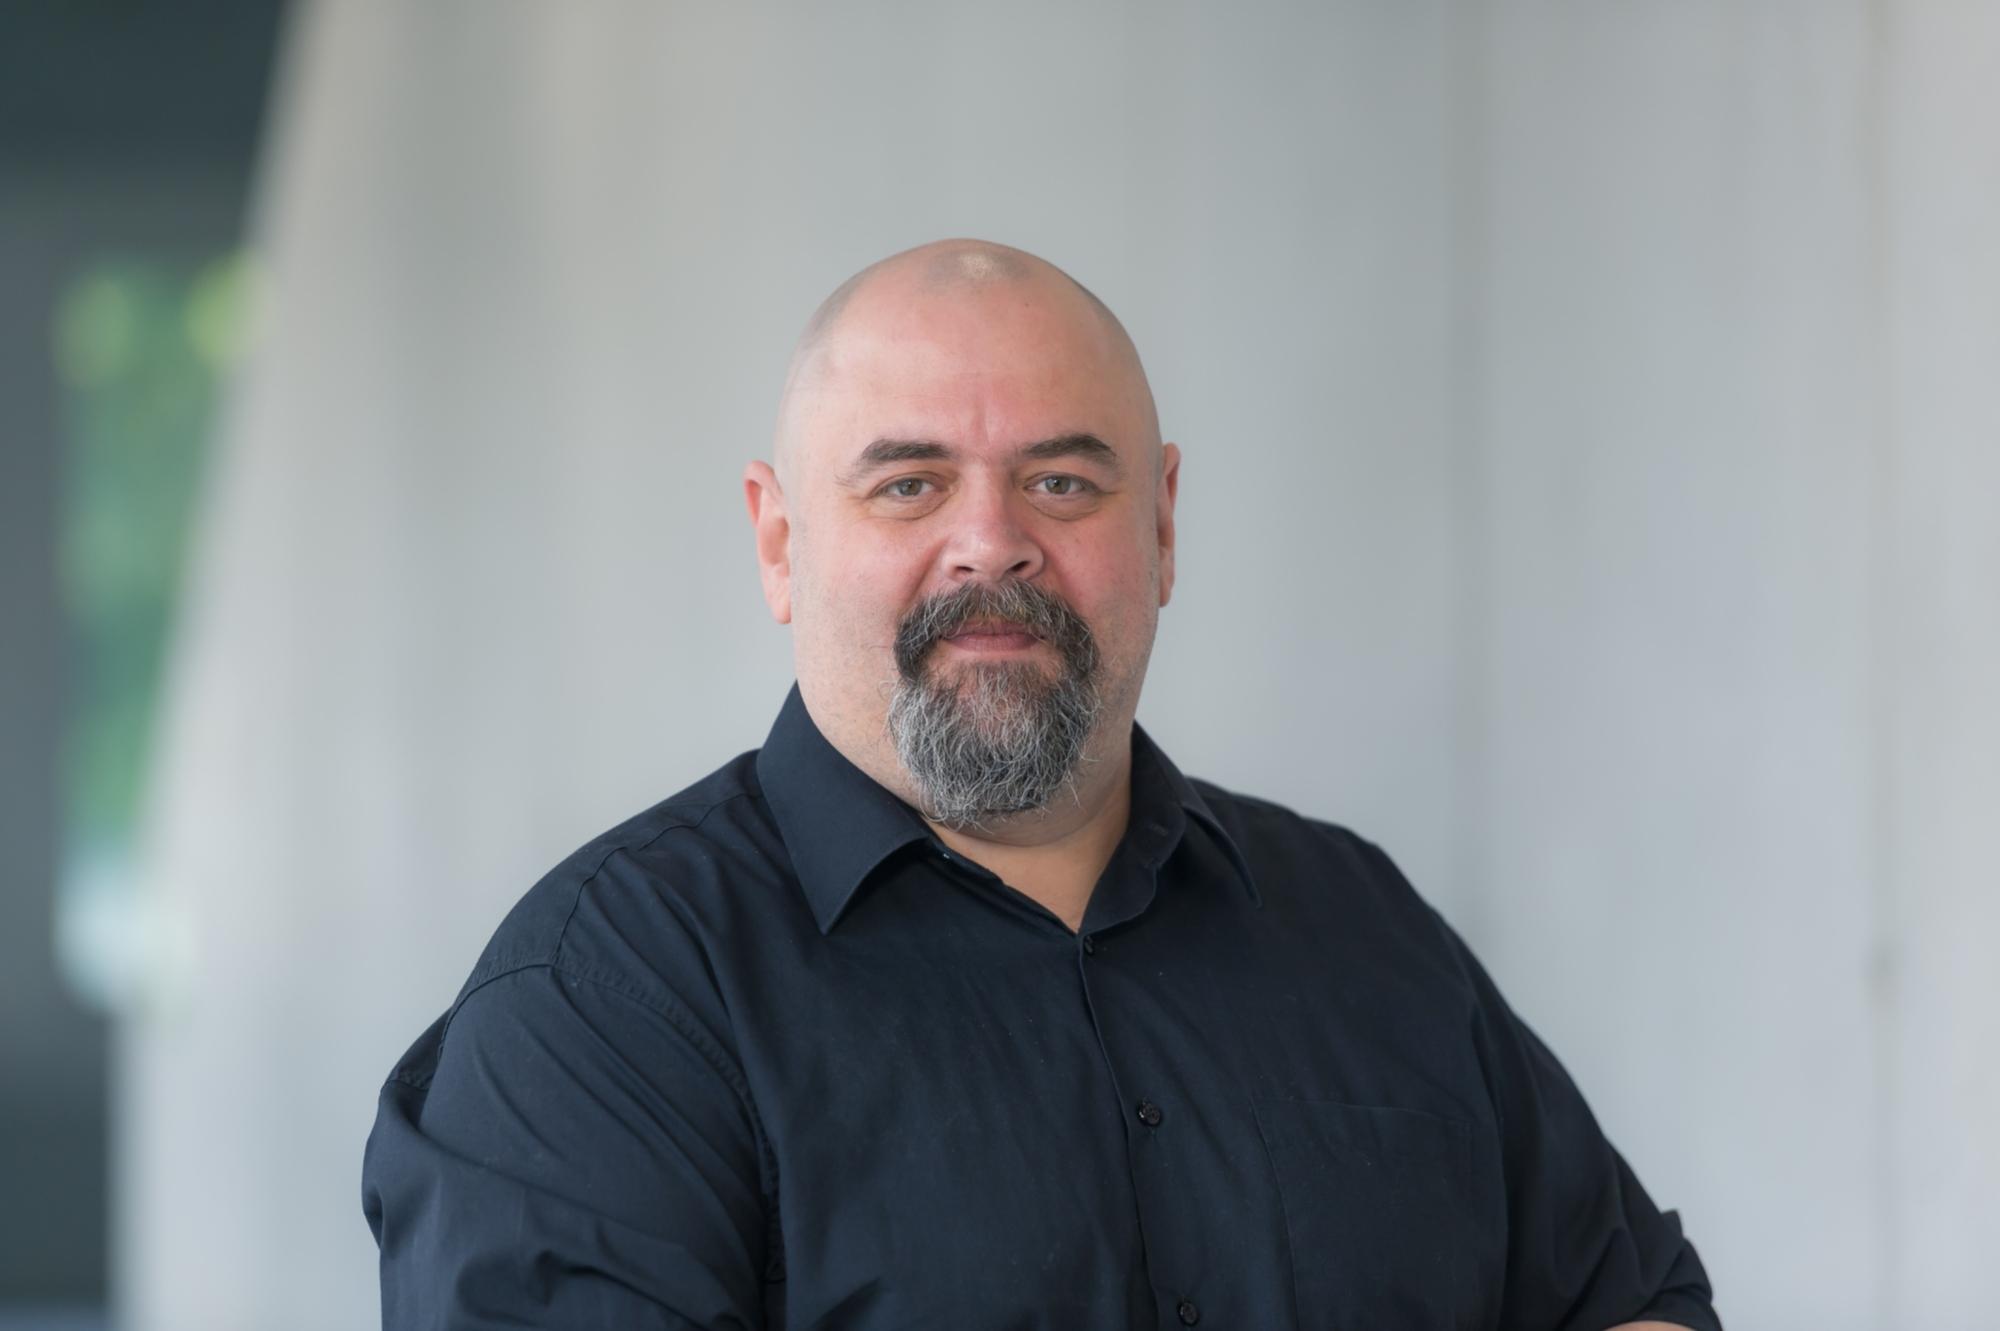 Dr. Nikolaos K. Karadimitriou